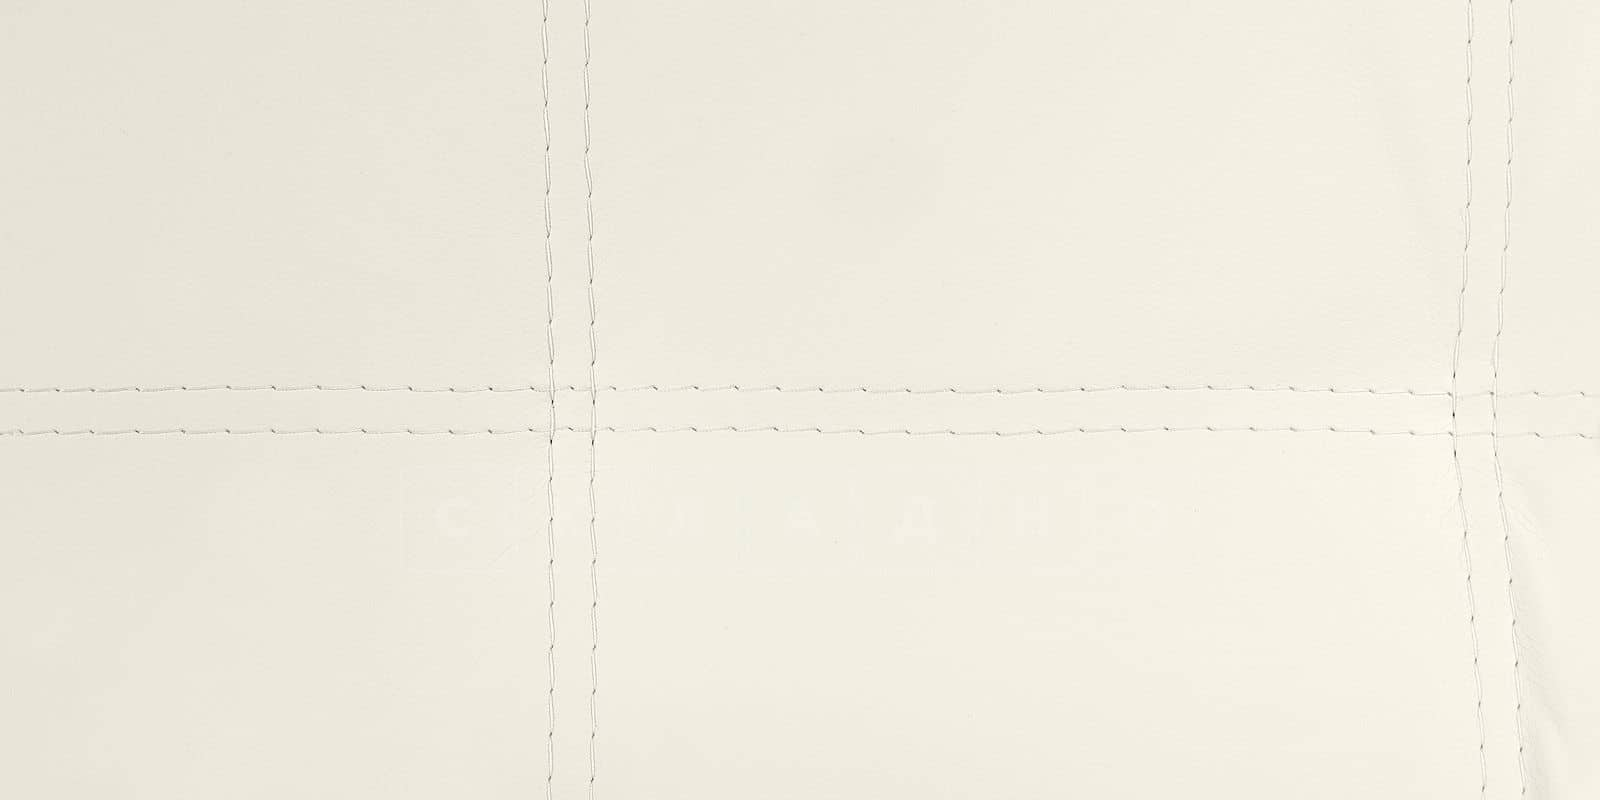 Диван Атланта экокожа молочного цвета фото 7   интернет-магазин Складно